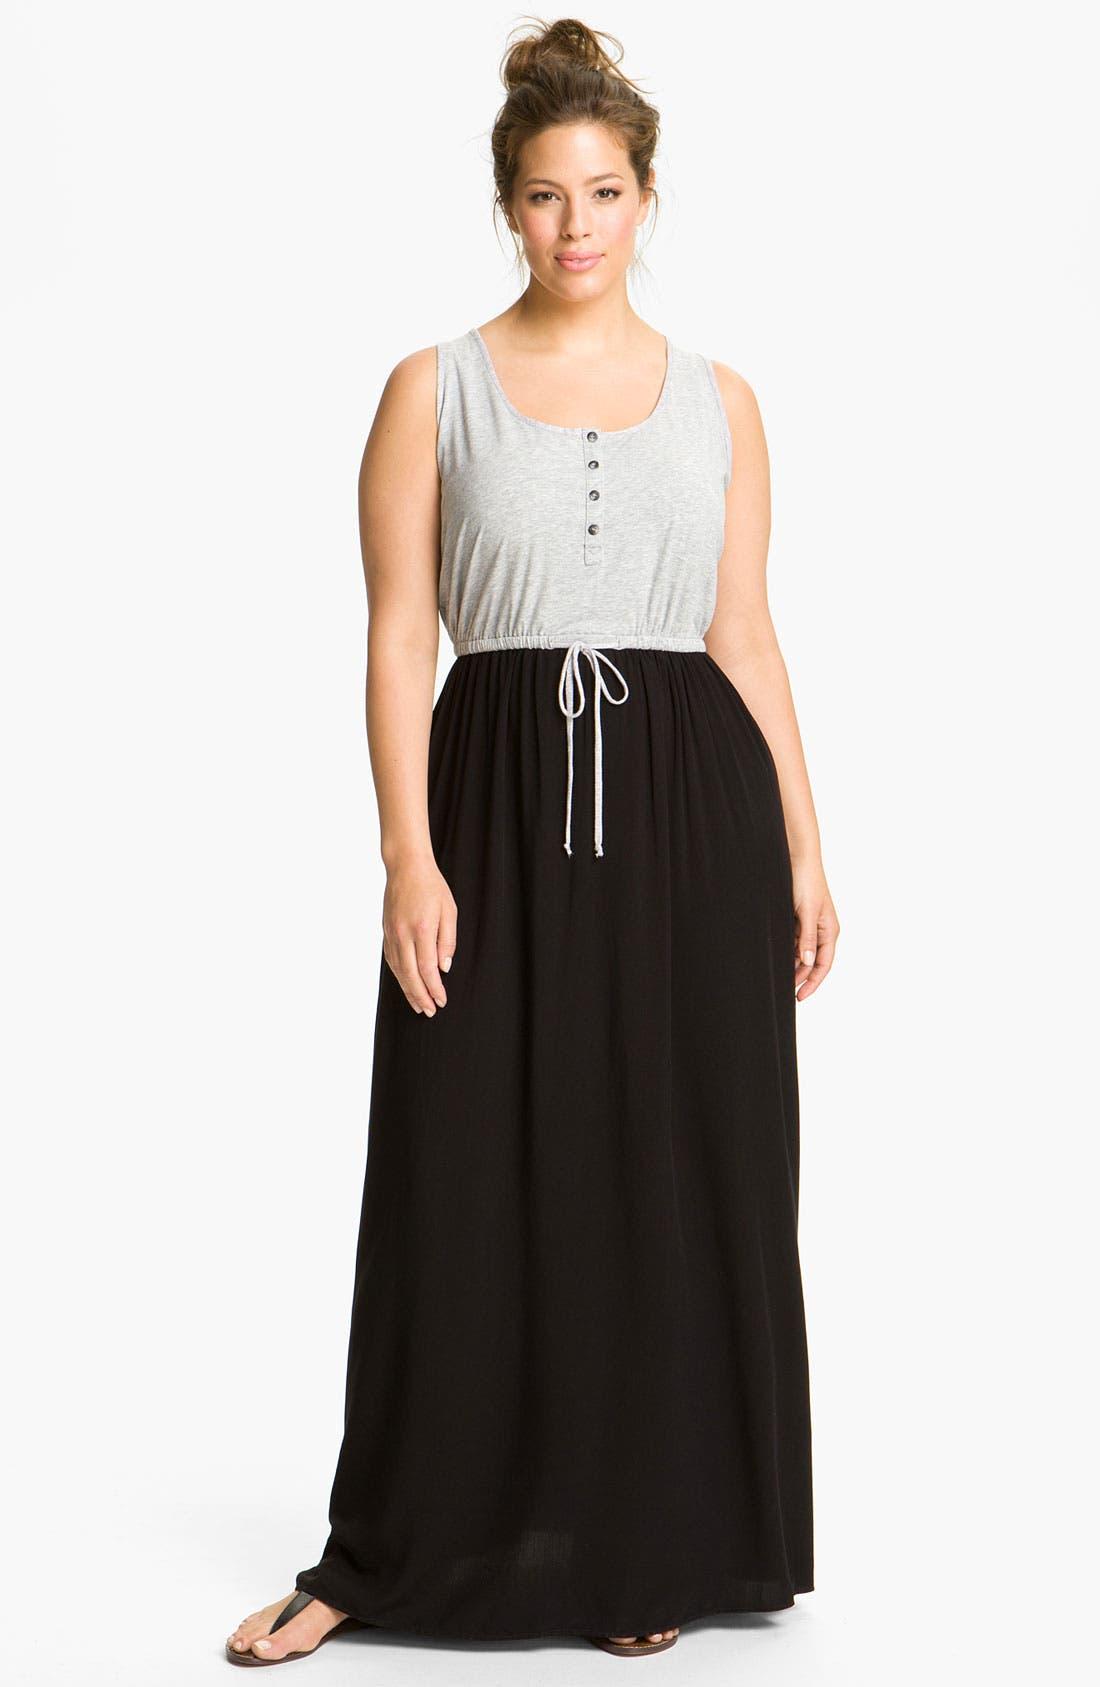 Alternate Image 1 Selected - Splendid Mixed Media Maxi Dress (Plus)